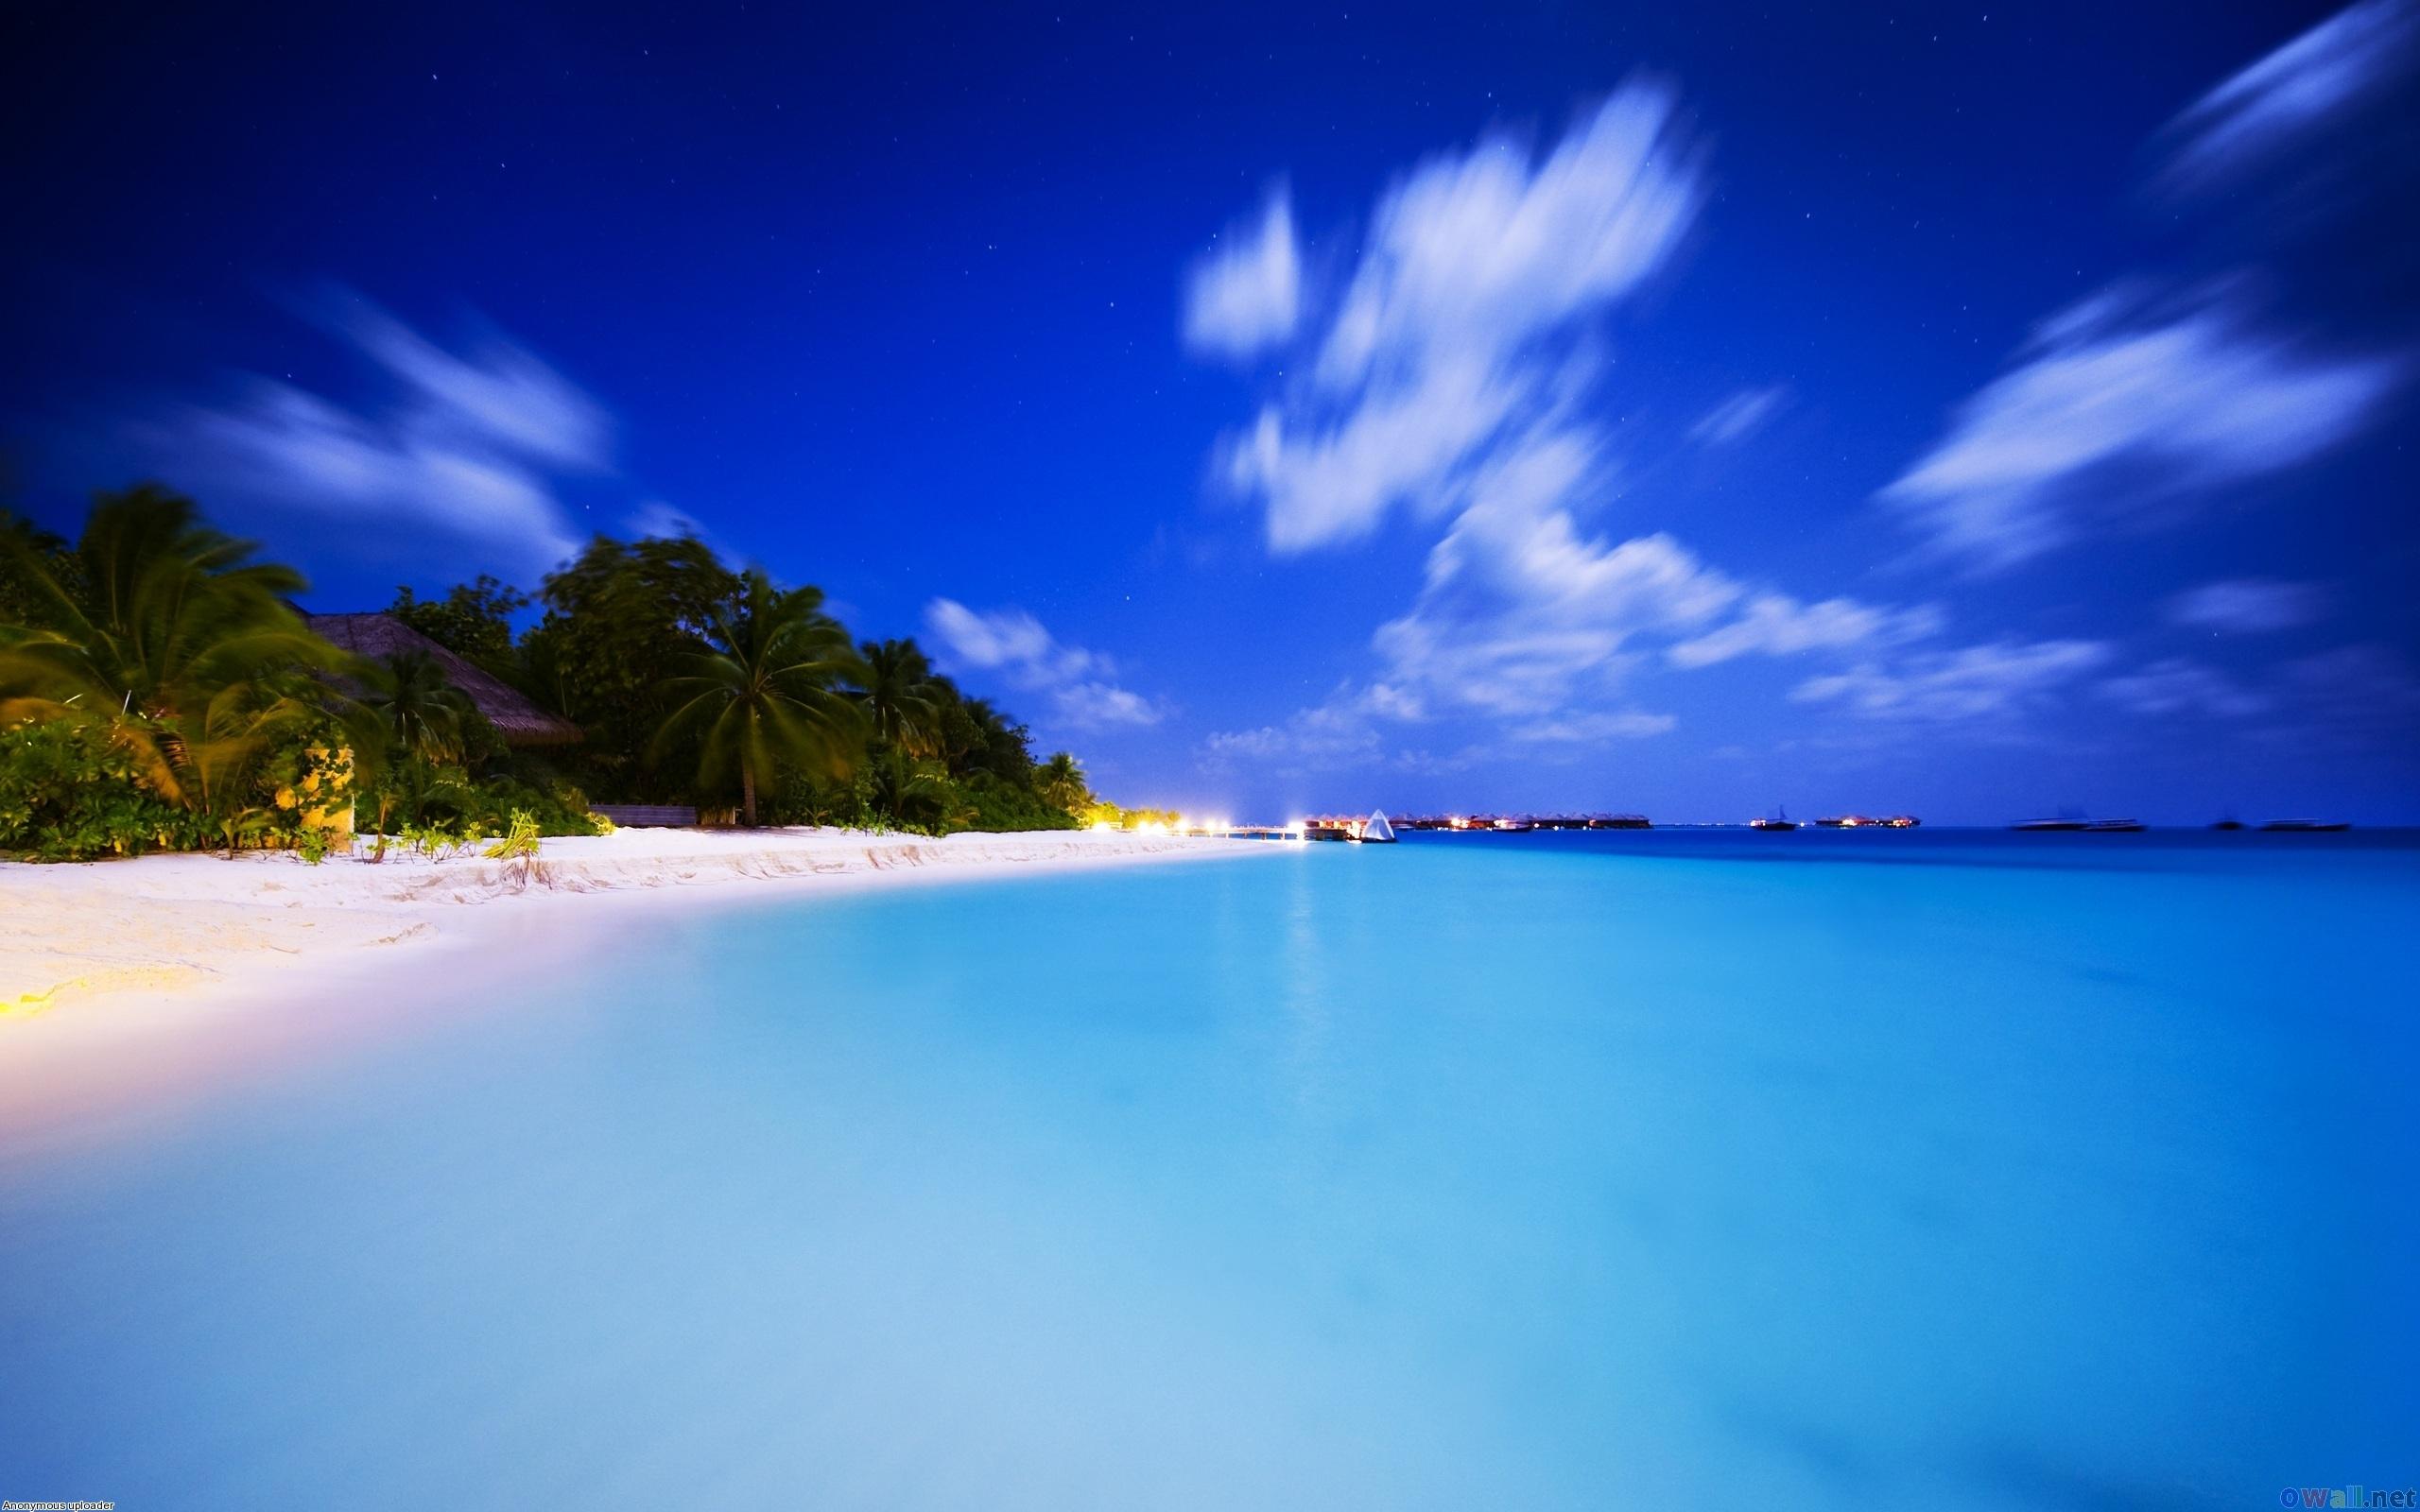 Neotropical Sommer Strand 2560x1600 HD Hintergrundbilder